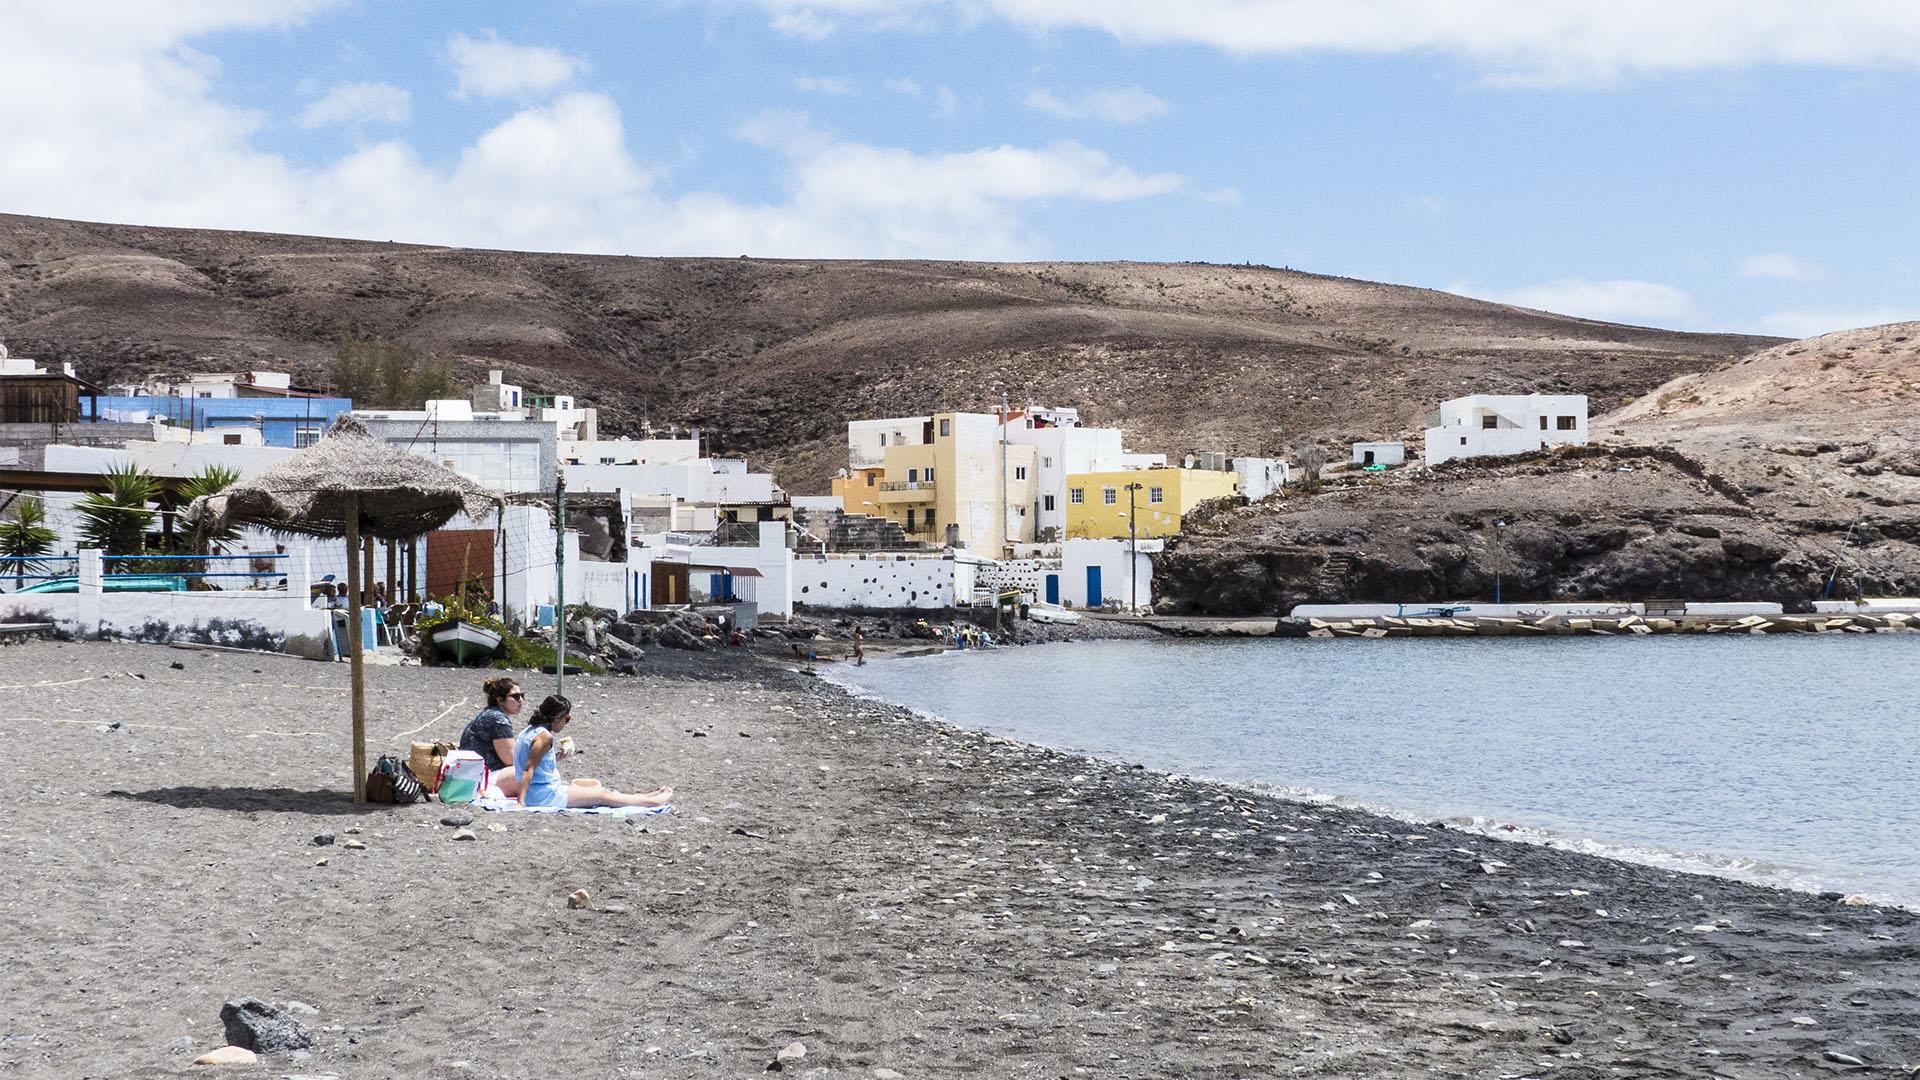 Die Strände Fuerteventuras: Playa de Taralalejo.